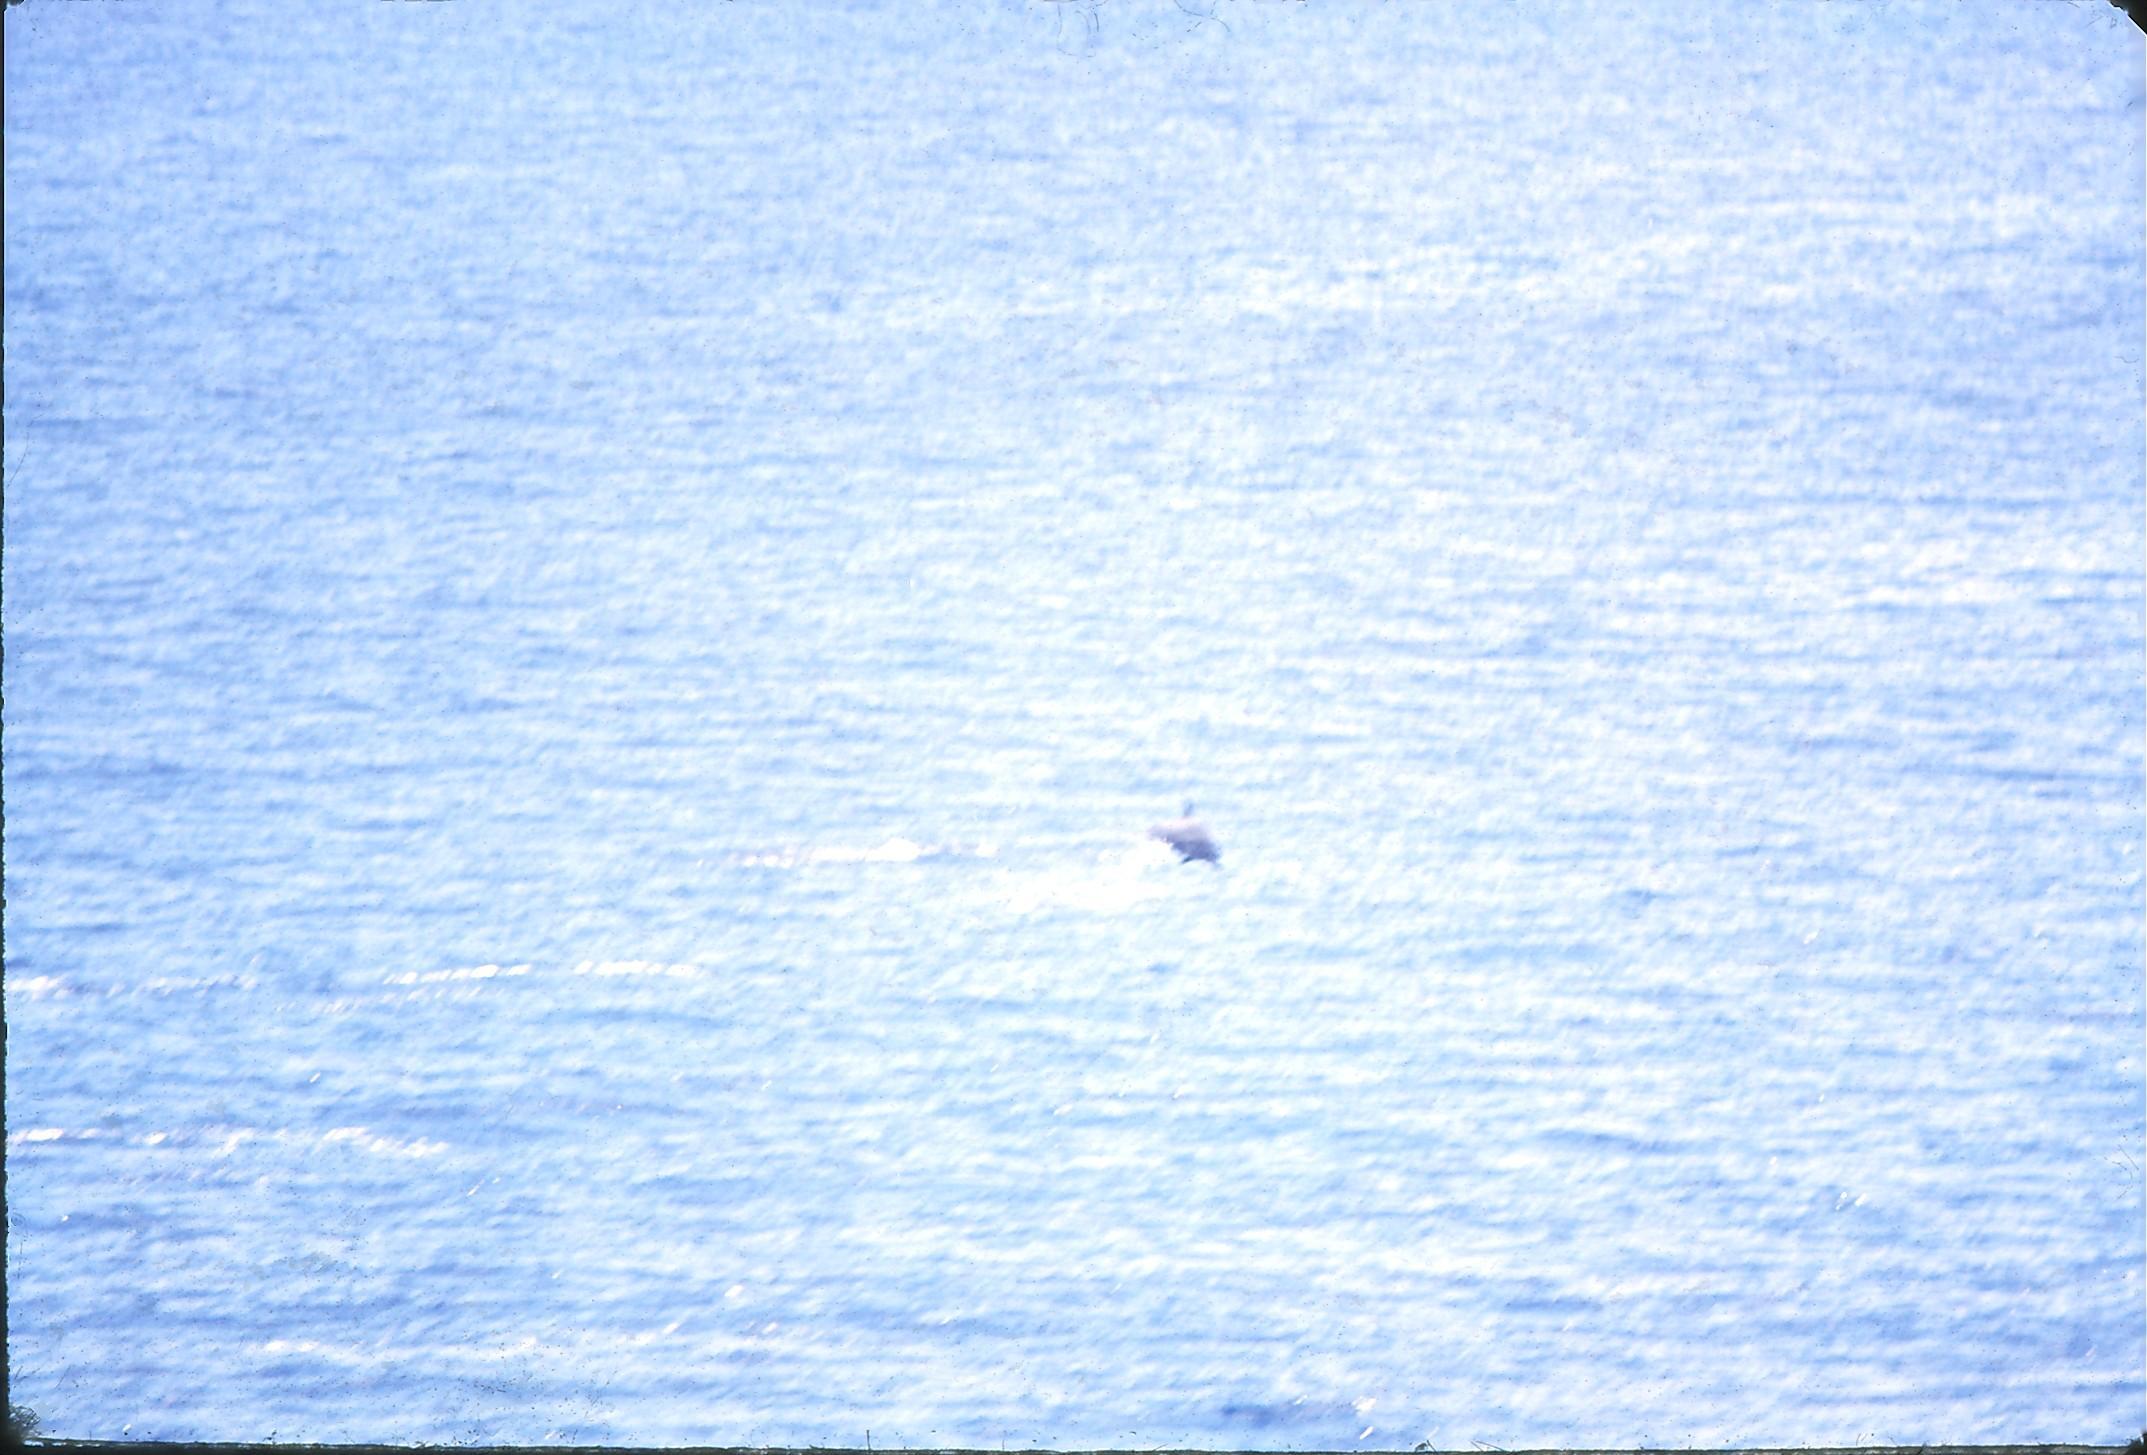 14-Dolphins-4.jpeg